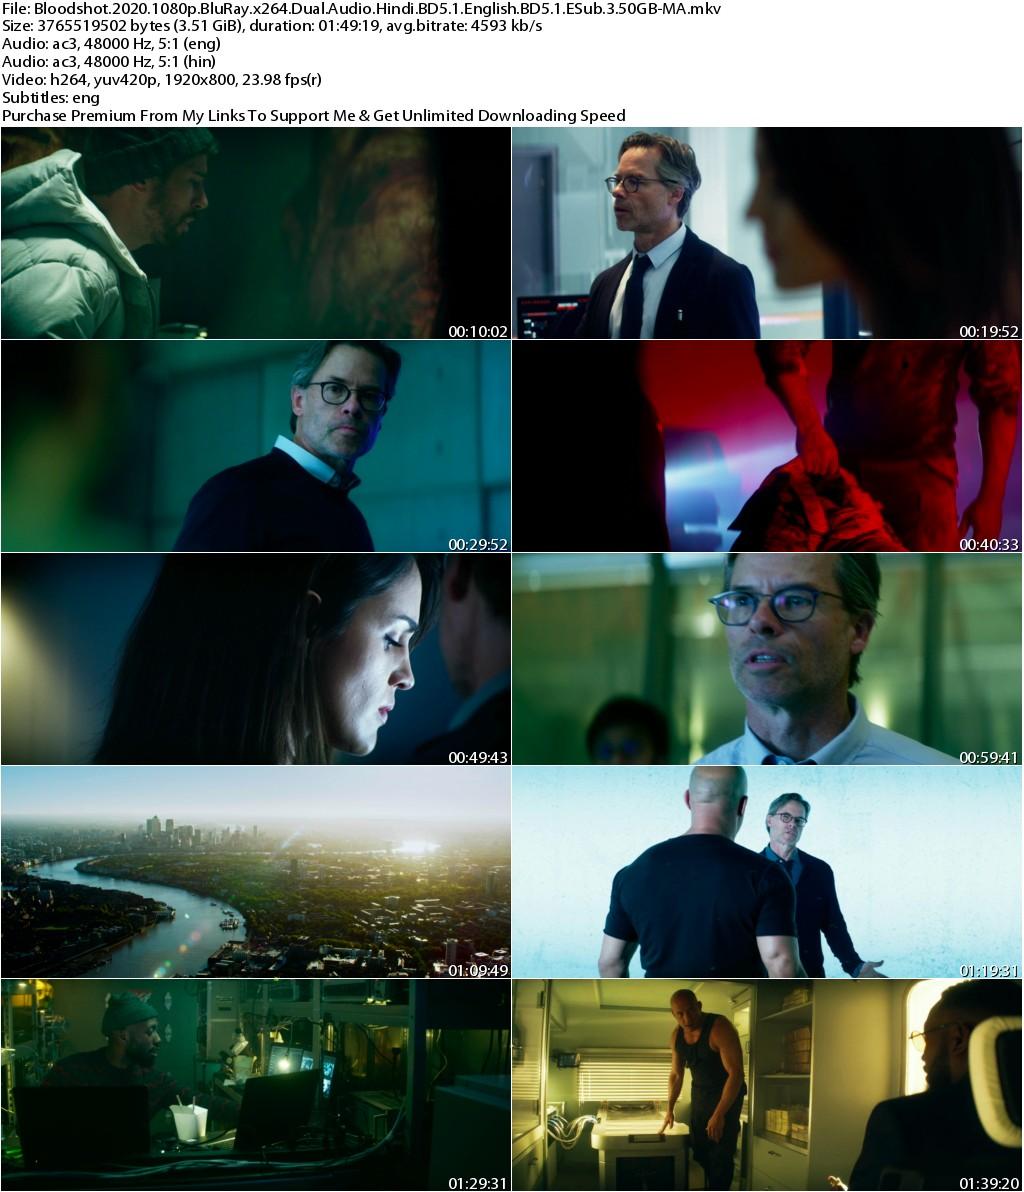 Bloodshot (2020) 1080p BluRay x264 Dual Audio Hindi BD5.1 English BD5.1 ESub 3.50GB-MA